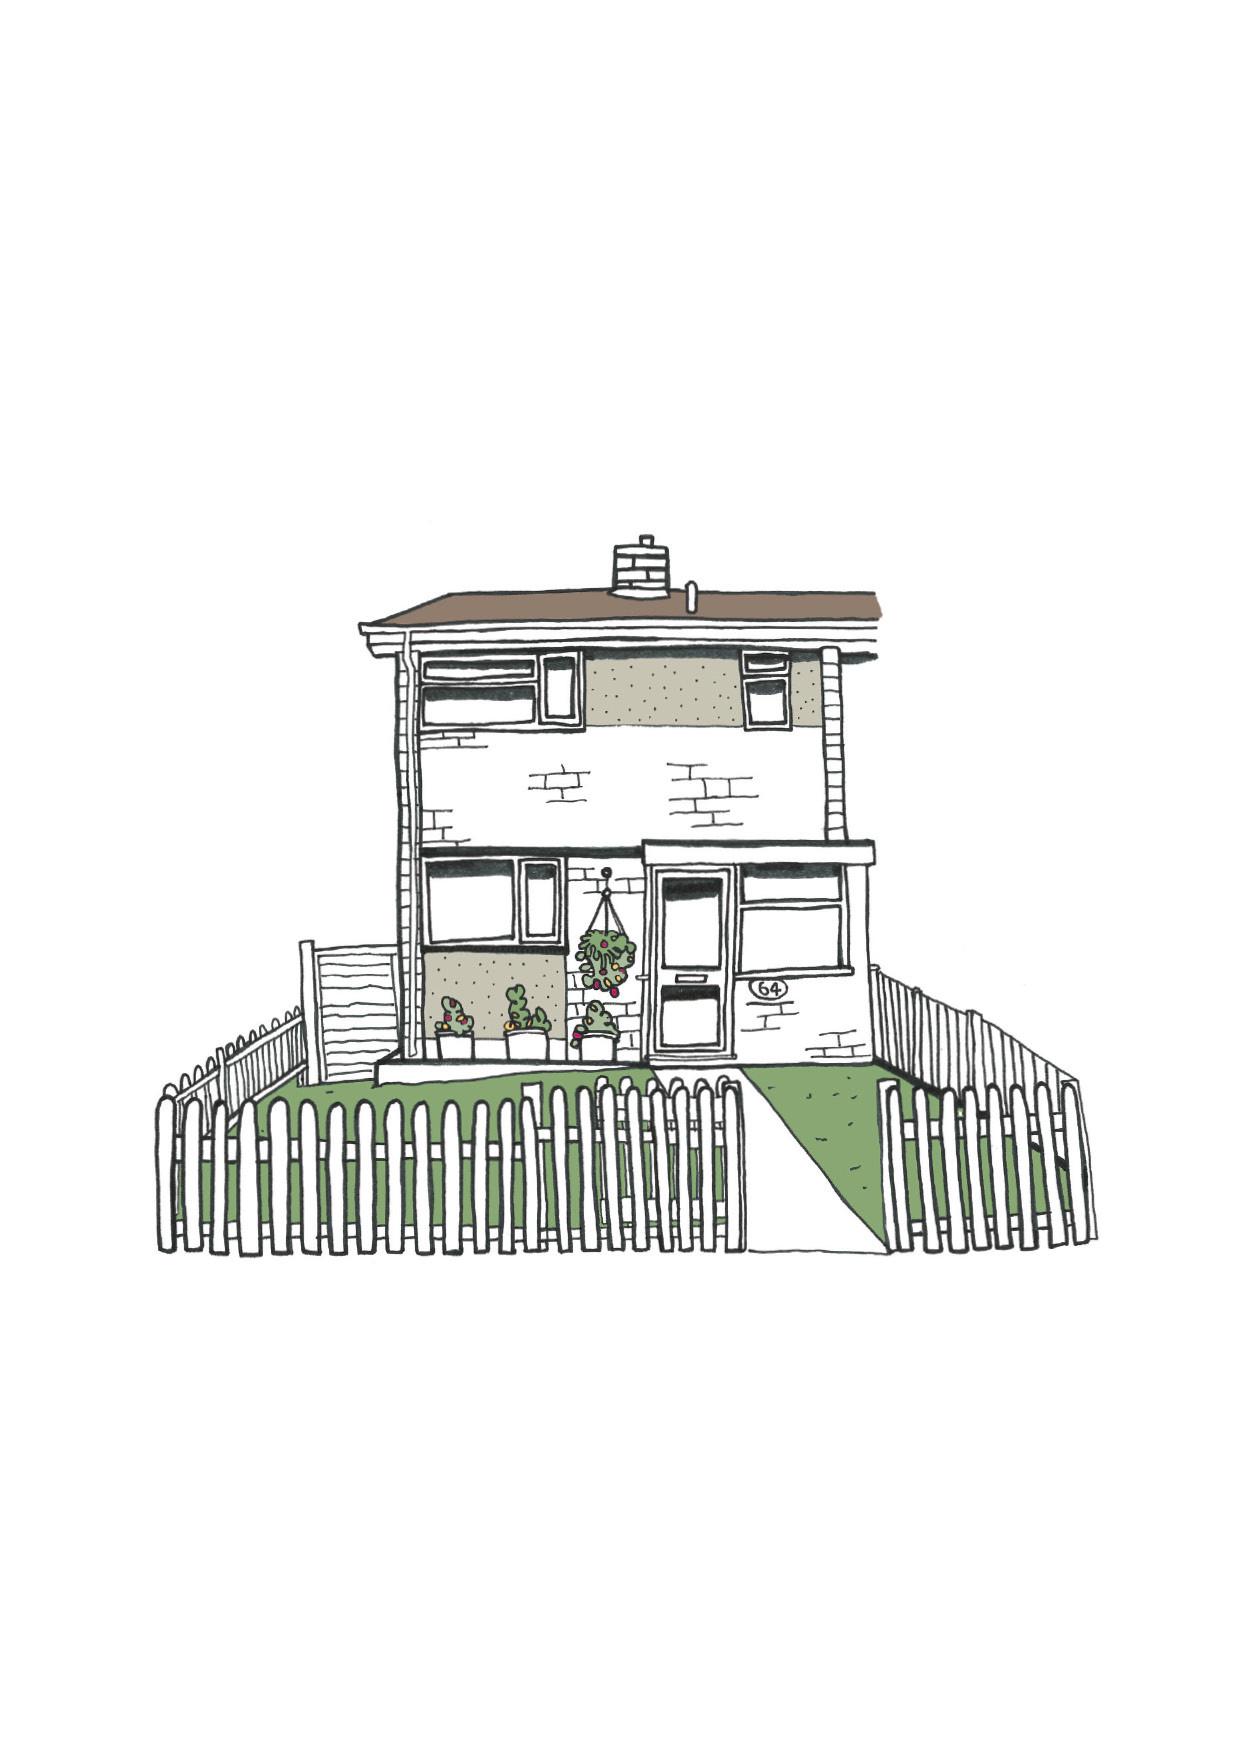 House jpegs for web5.jpg